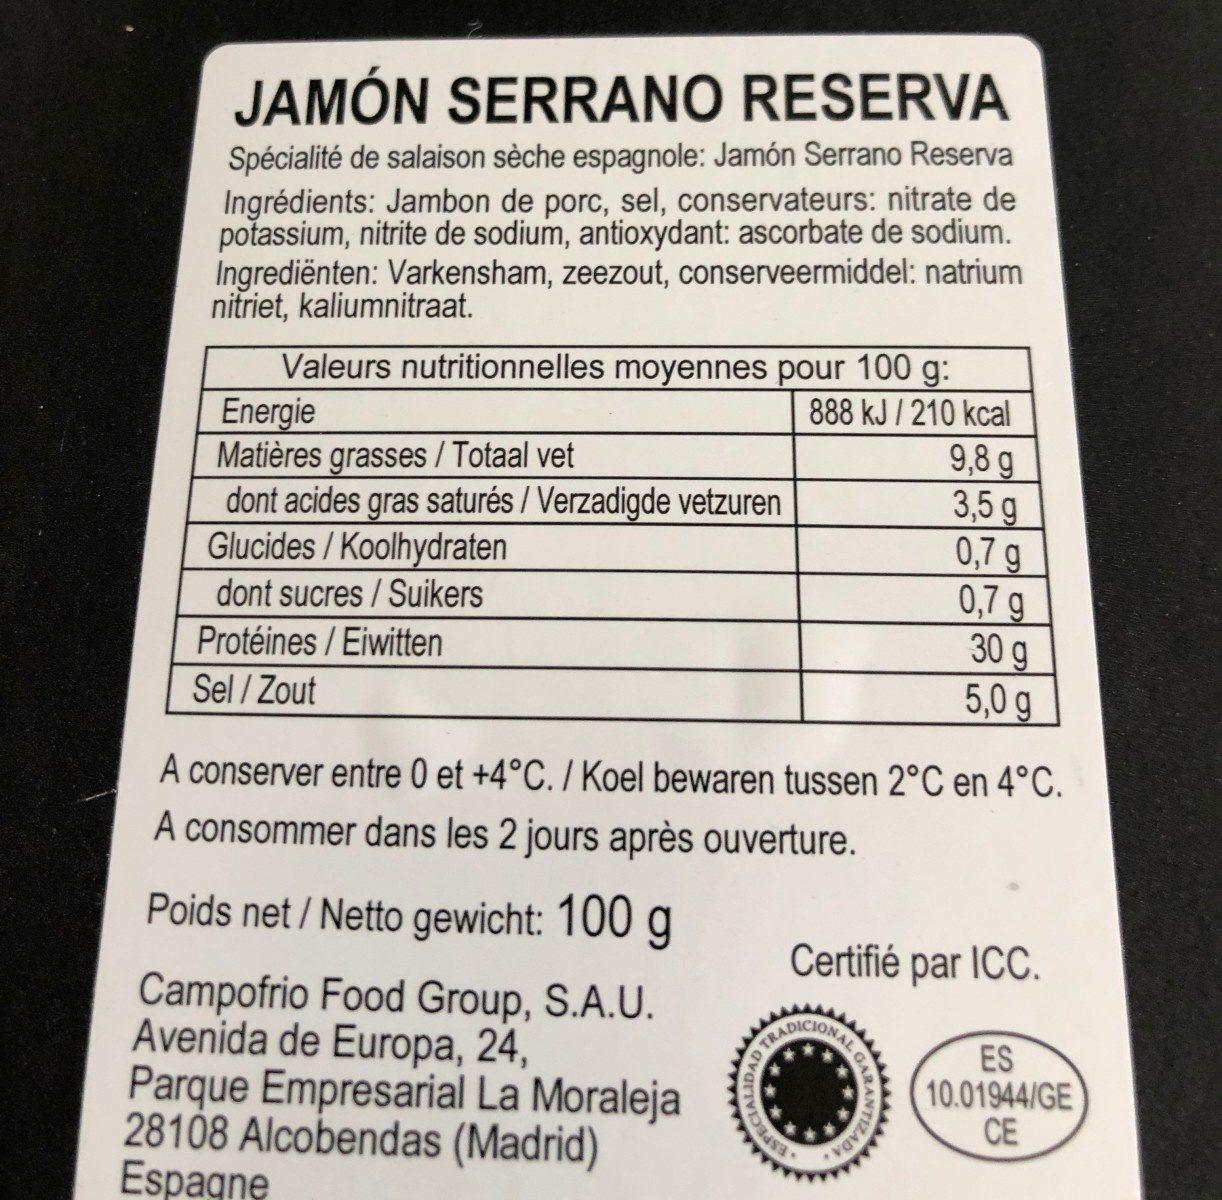 Jamon serrano reserva - Ingrédients